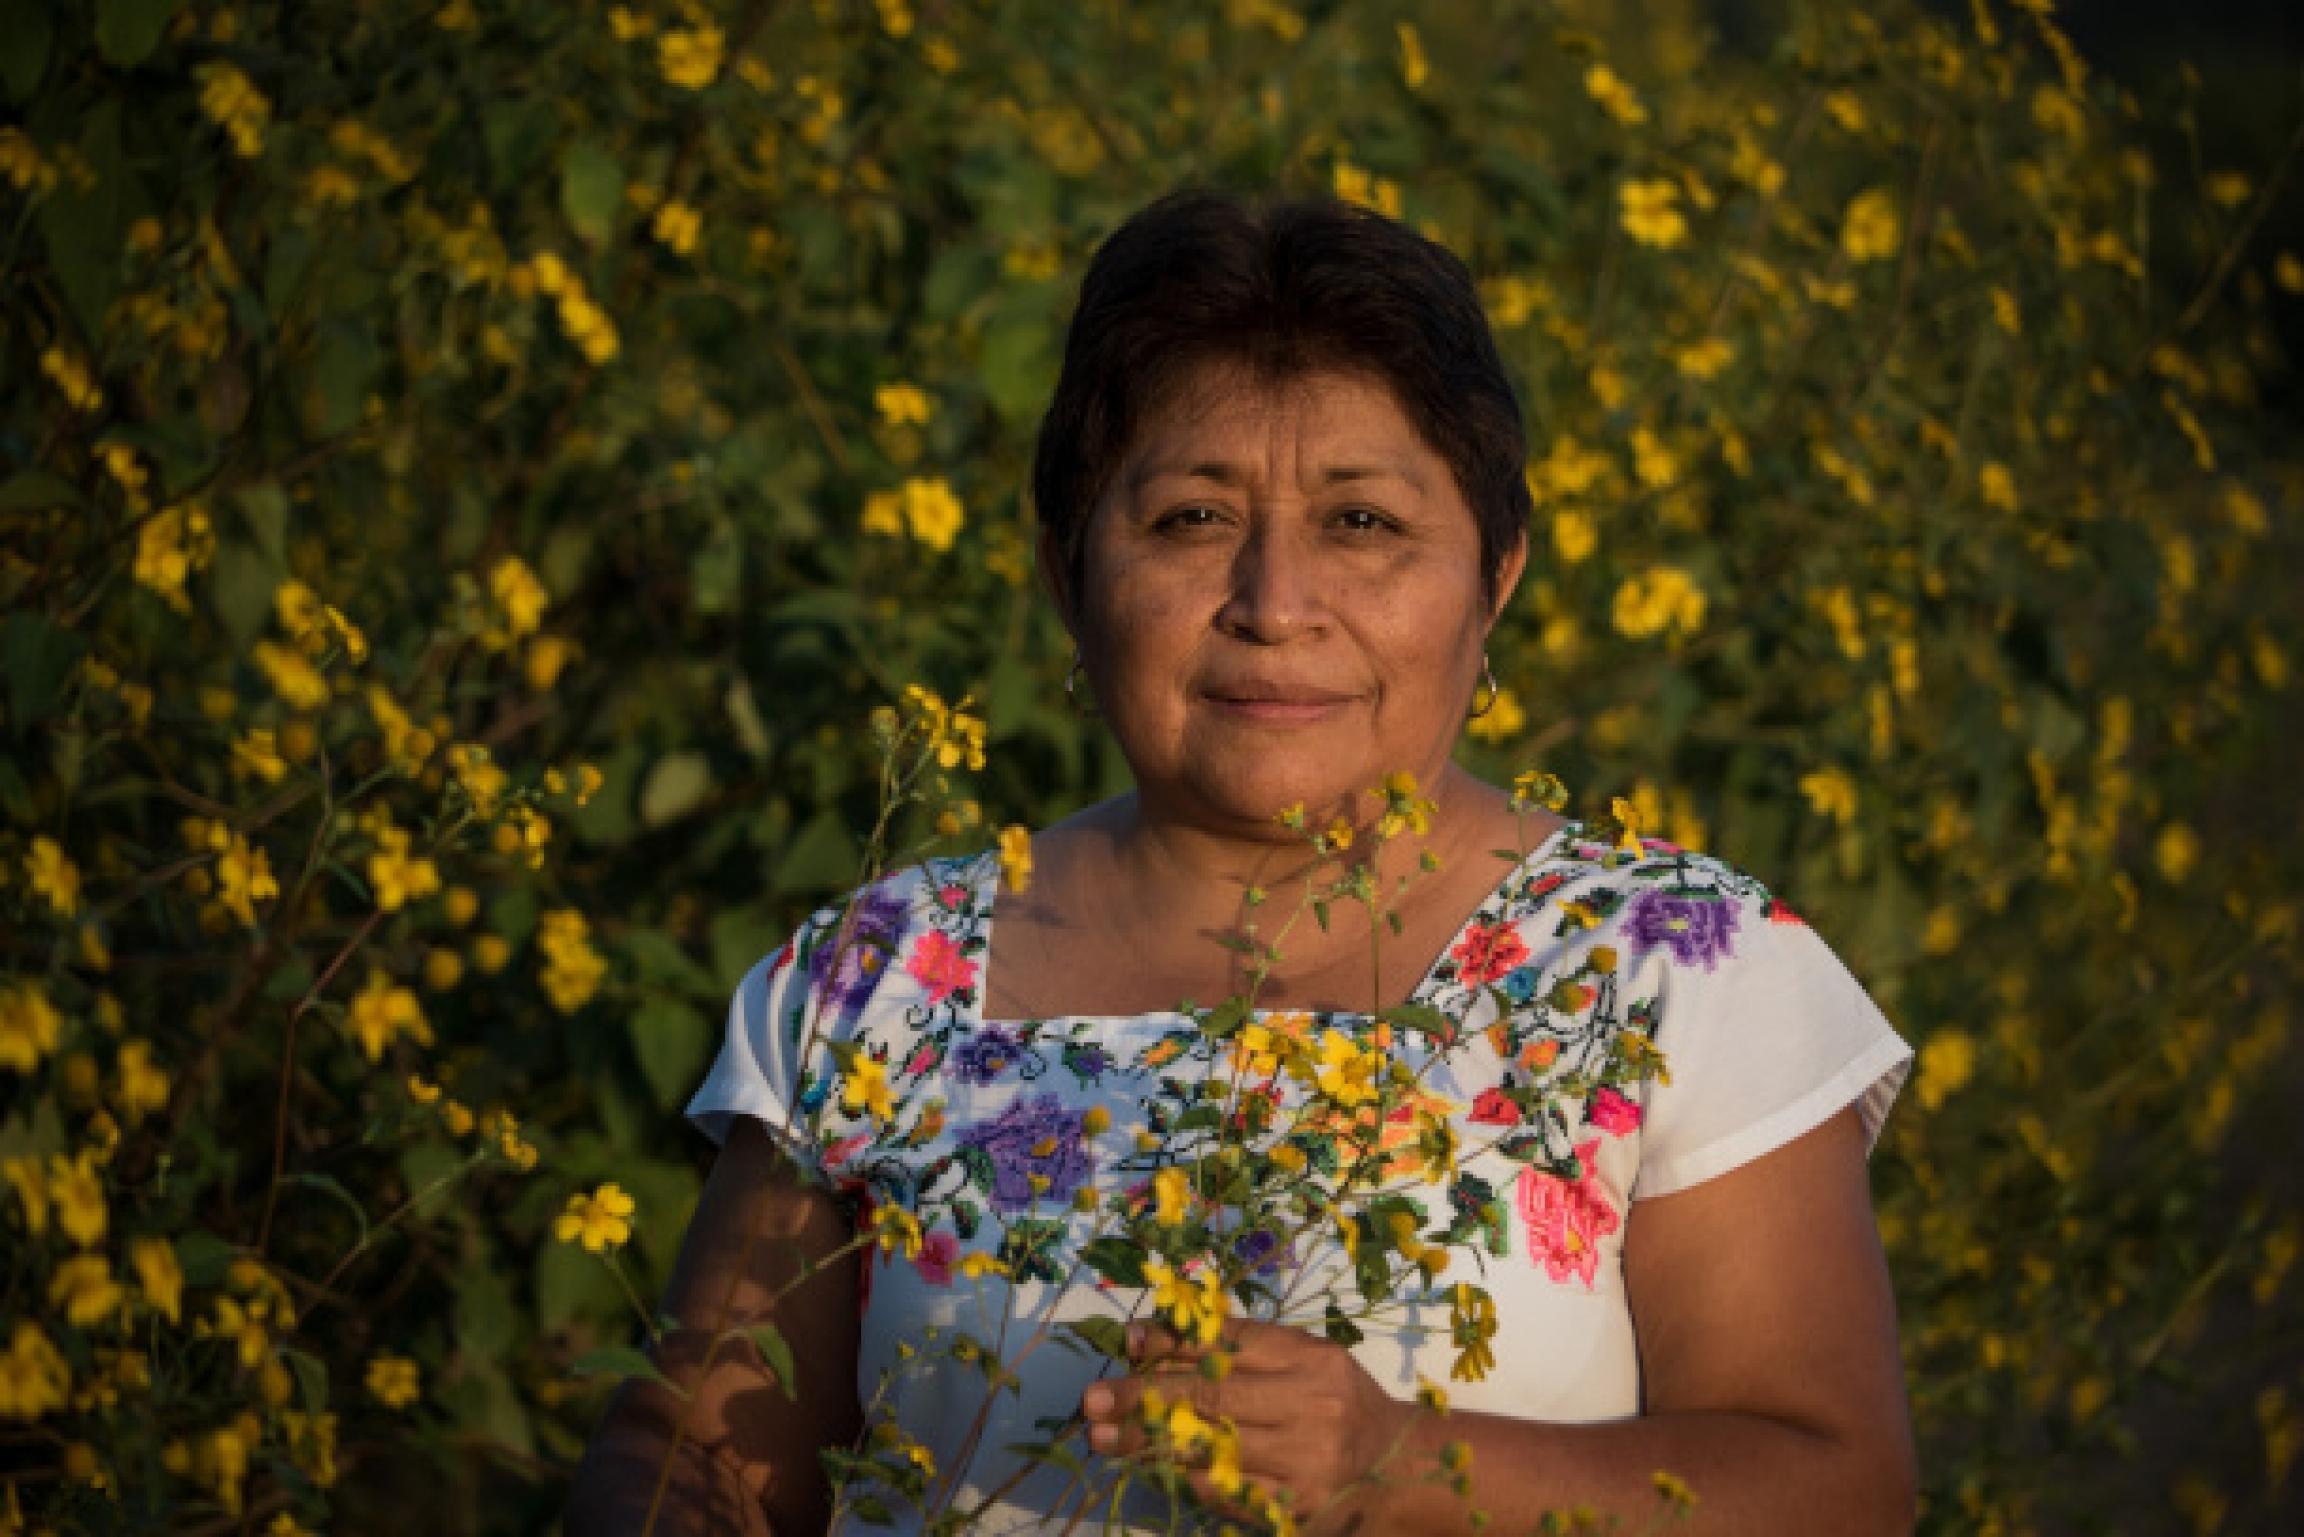 A photo of Leydy Pech, a Mayan beekeeper